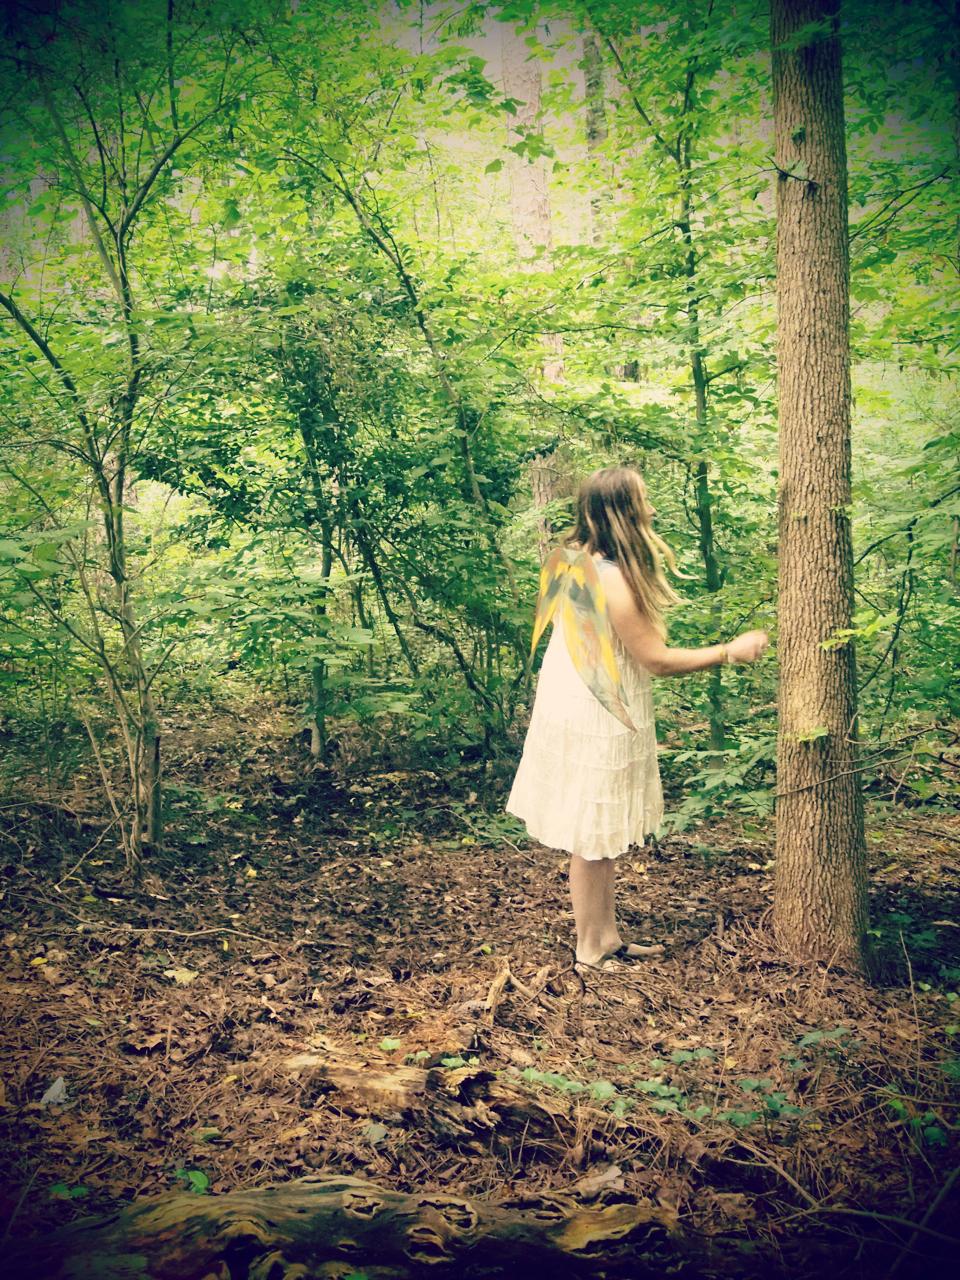 bloggy faerie in woods3.jpg